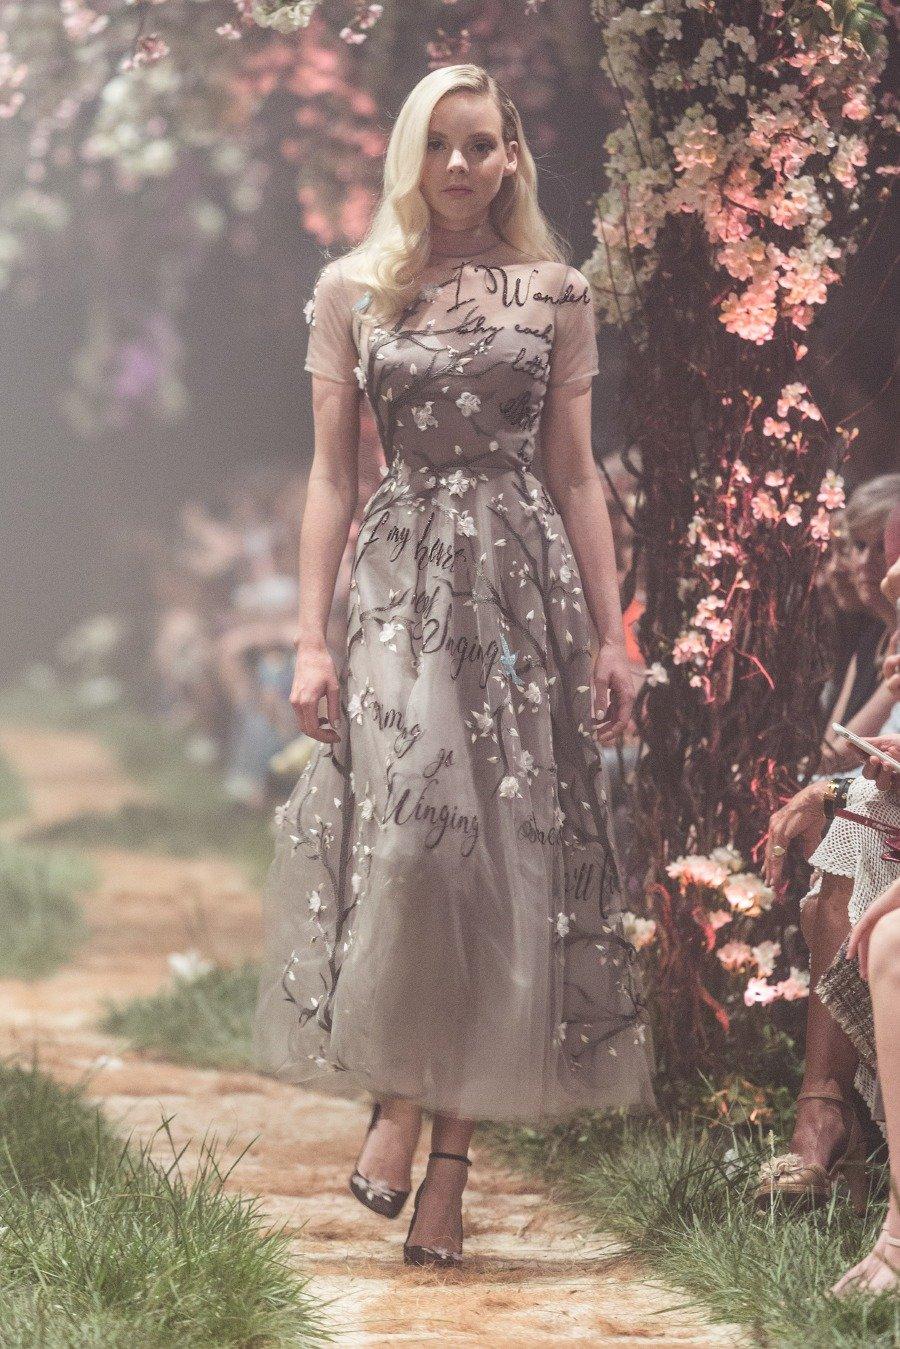 3335e780f98 A dress embroidered with the lyrics of I Wonder from Sleeping Beauty. Photo  courtesy of Paolo Sebastian.